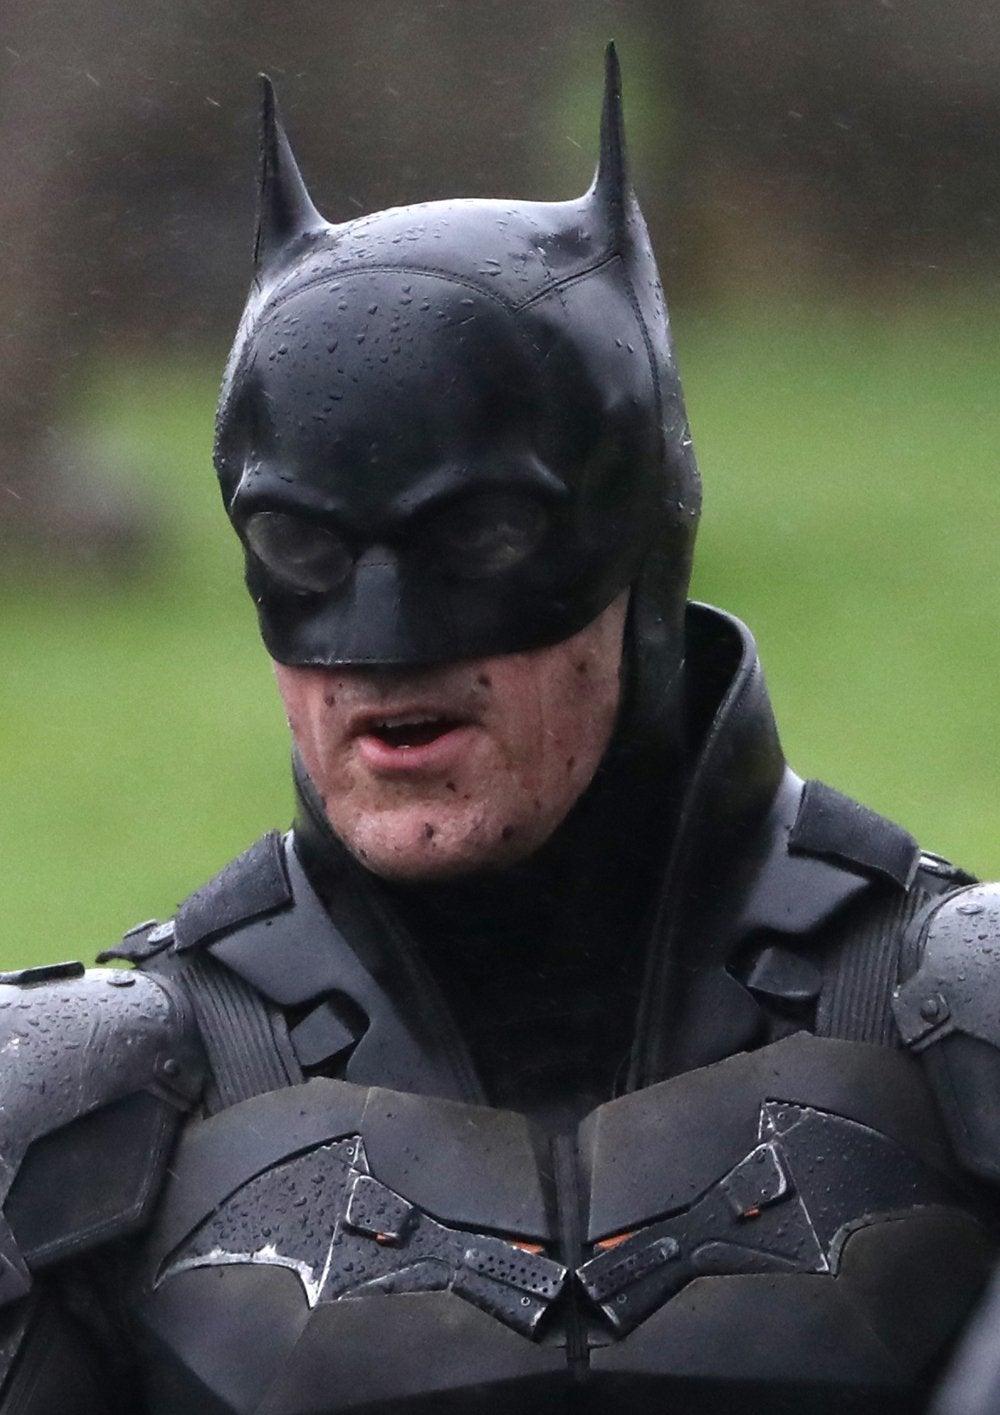 https://media.comicbook.com/2020/02/the-batman-set-photos-batsuit-batcycle-full-look-8-1207988.jpeg?auto=webp&width=1000&height=1415&crop=1000:1415,smart